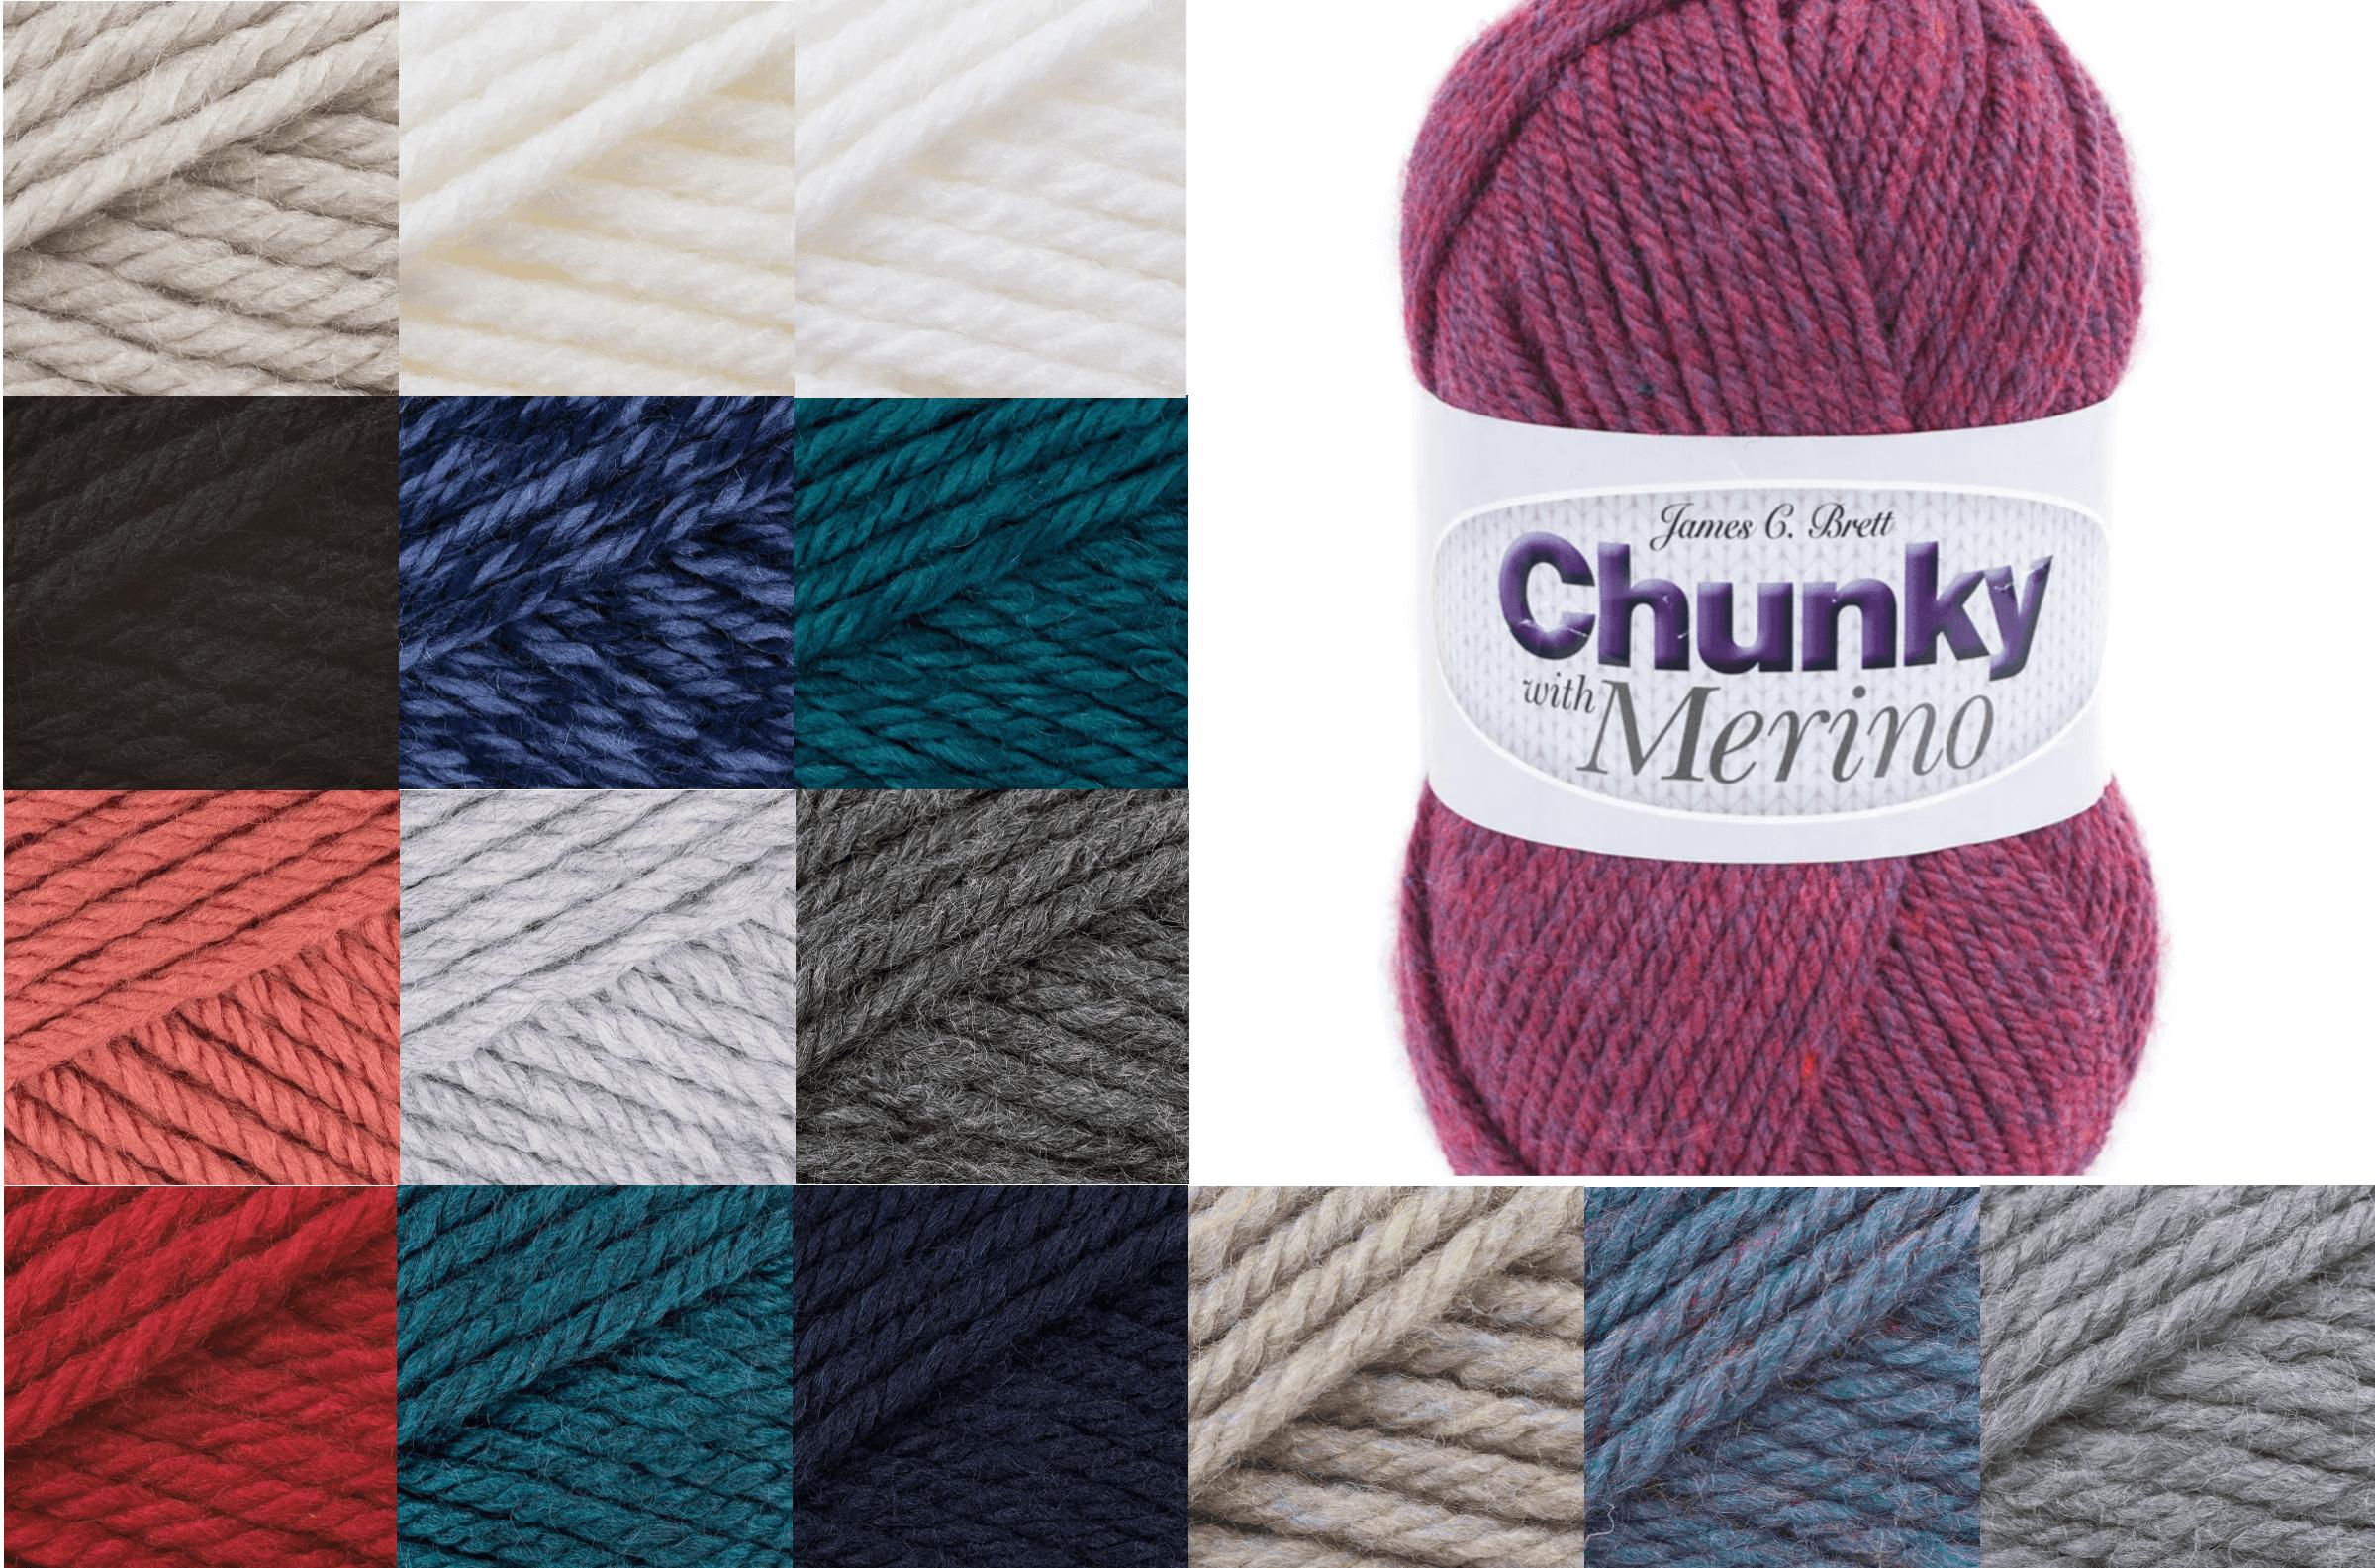 James C Brett Chunky With Merino Yarn 100g Ball Knitting Yarn Knit Craft CM1